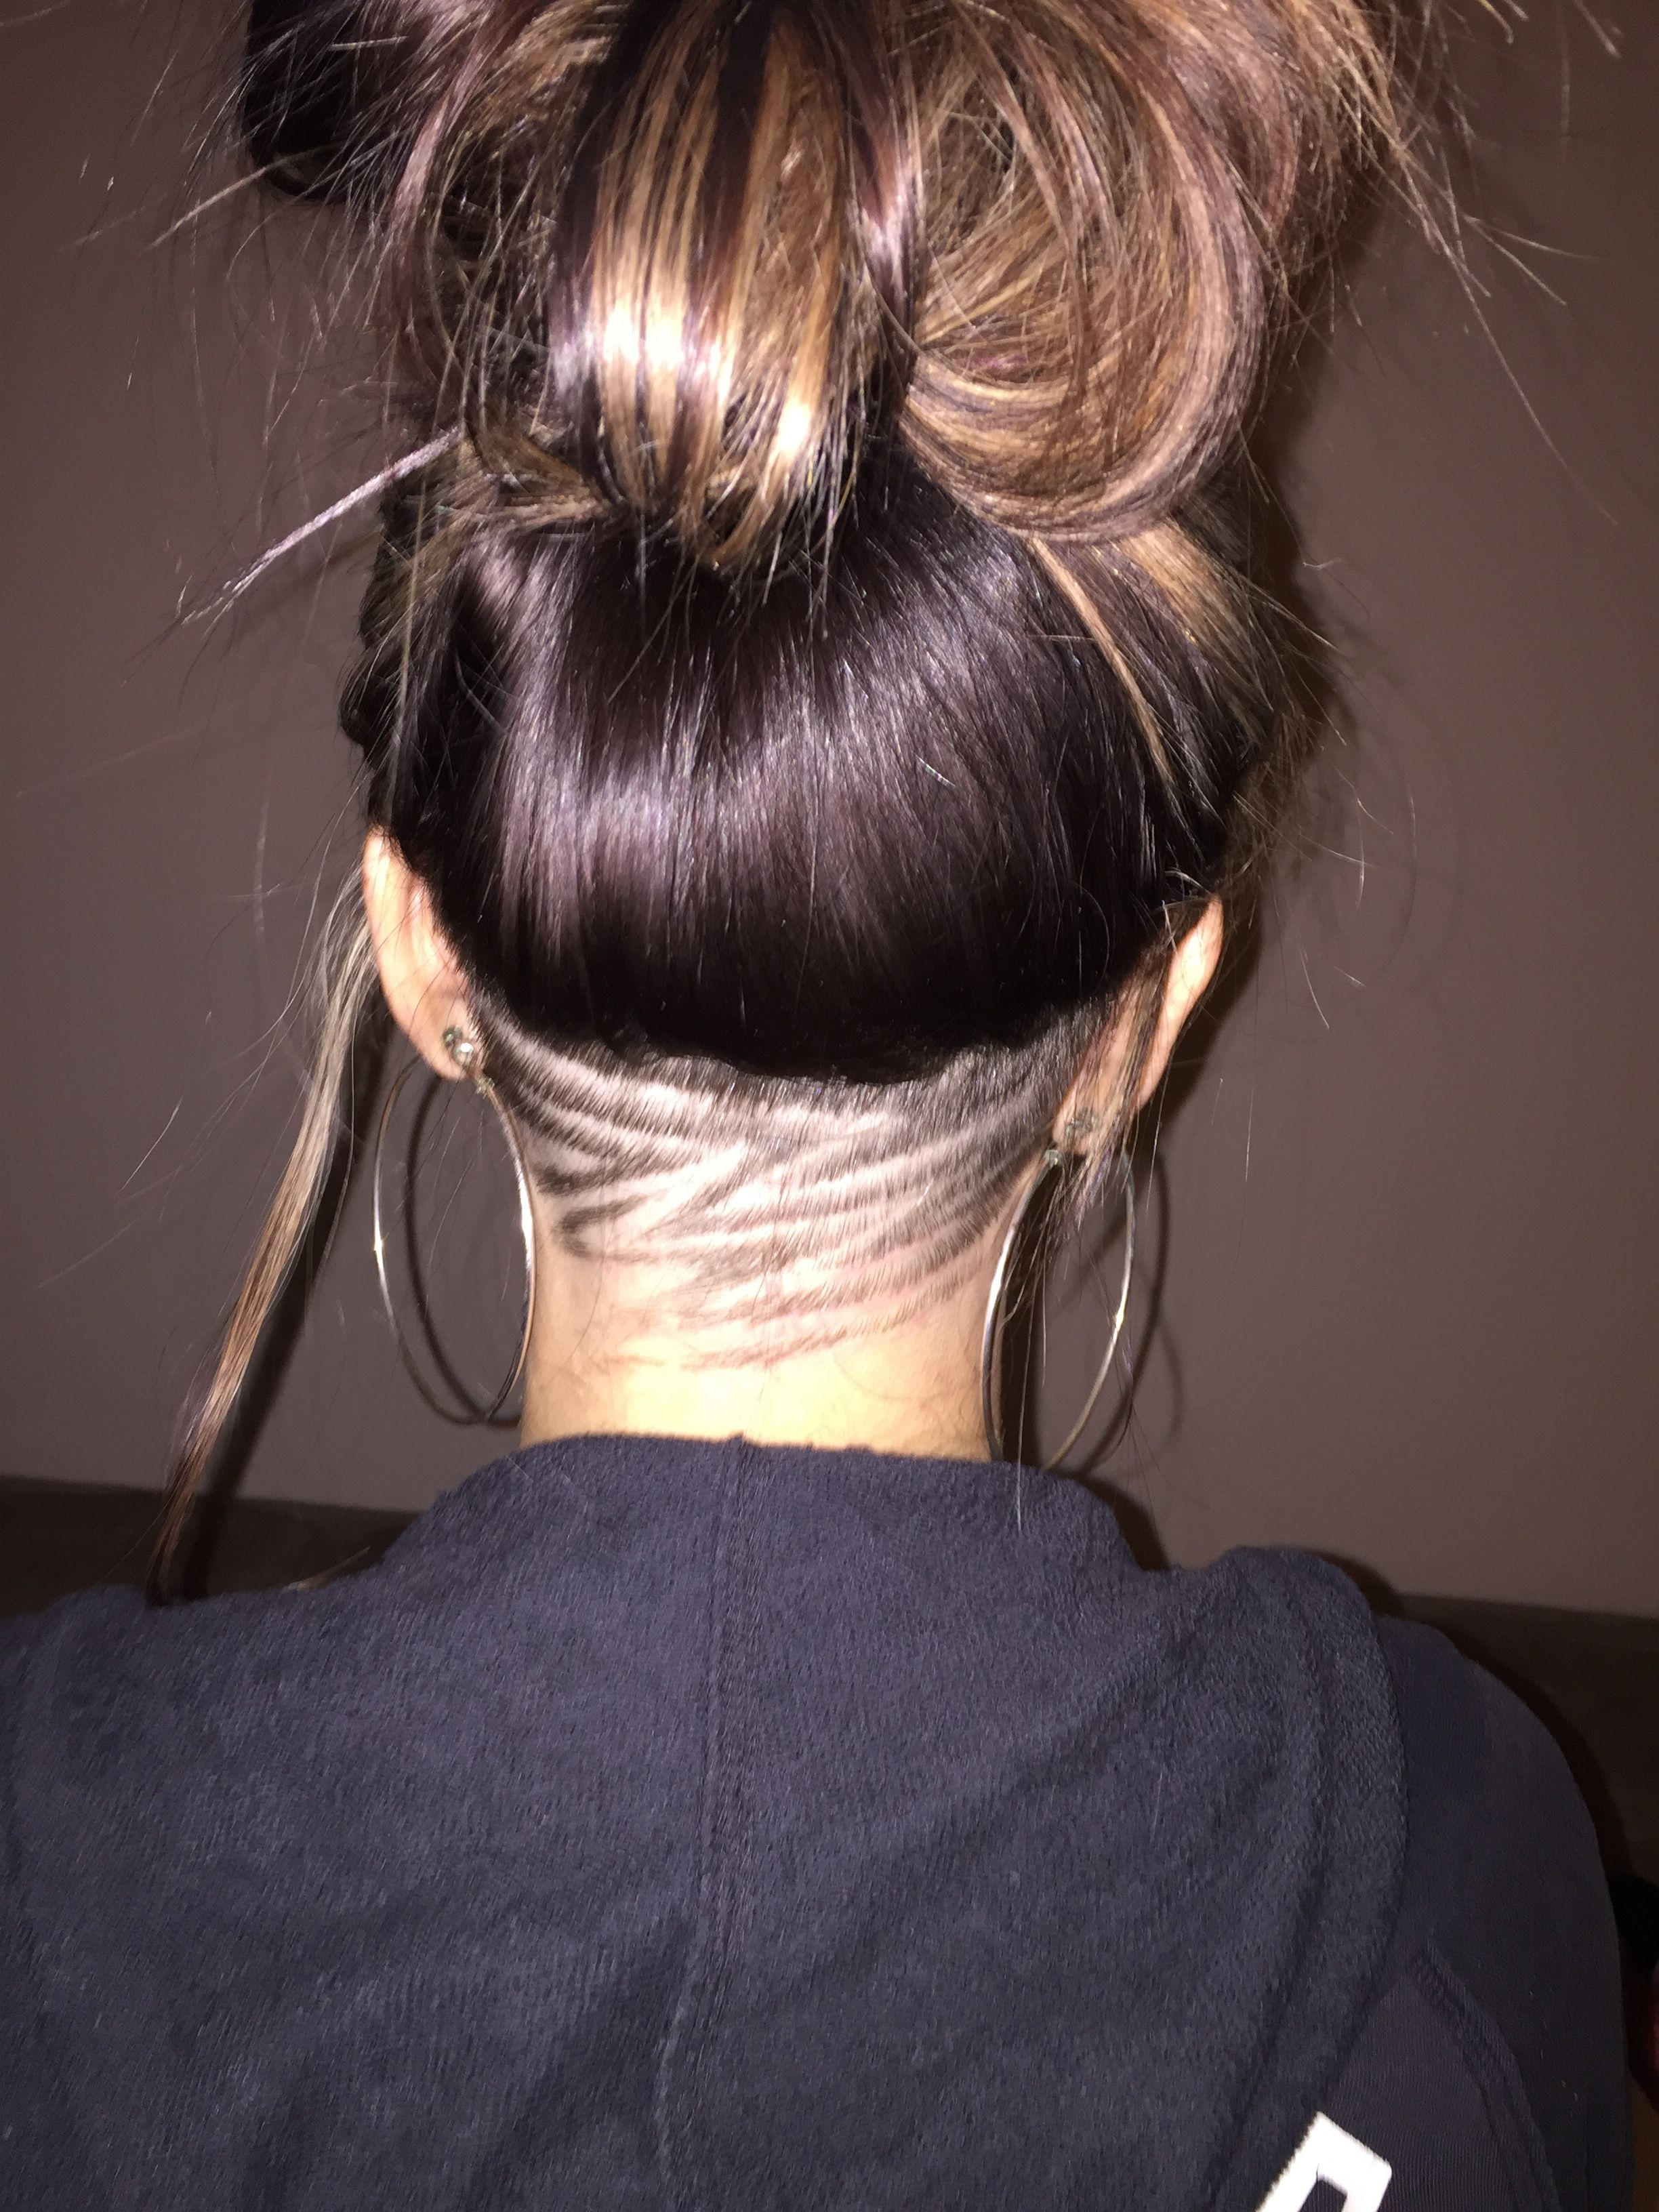 Undercut Design Undercut Hairstyles Undercut Long